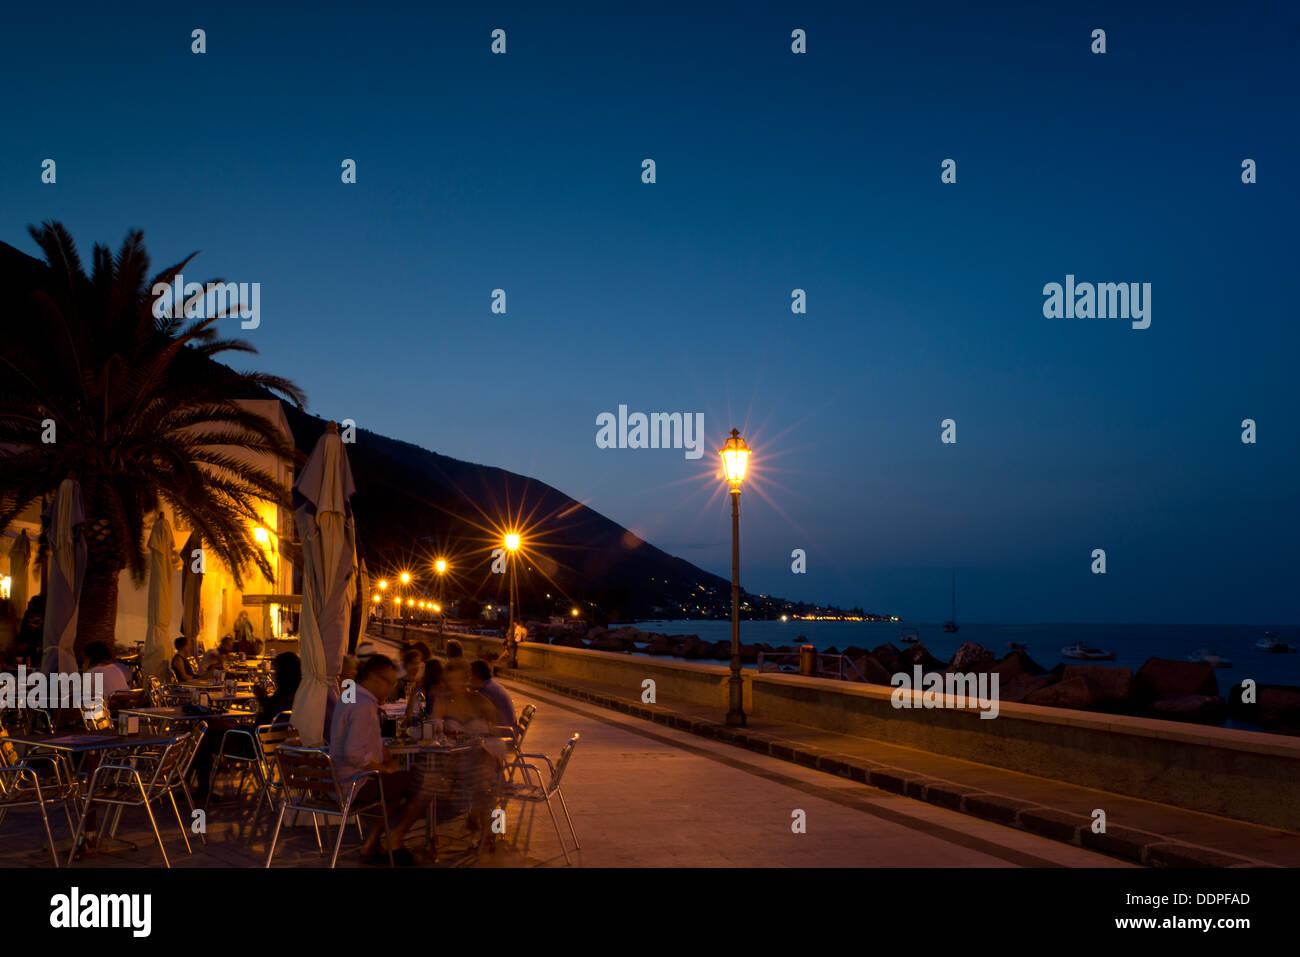 Restaurants at dusk along the seafront in Lingua, Salina, The Aeolian Islands, Sicily, Italy - Stock Image